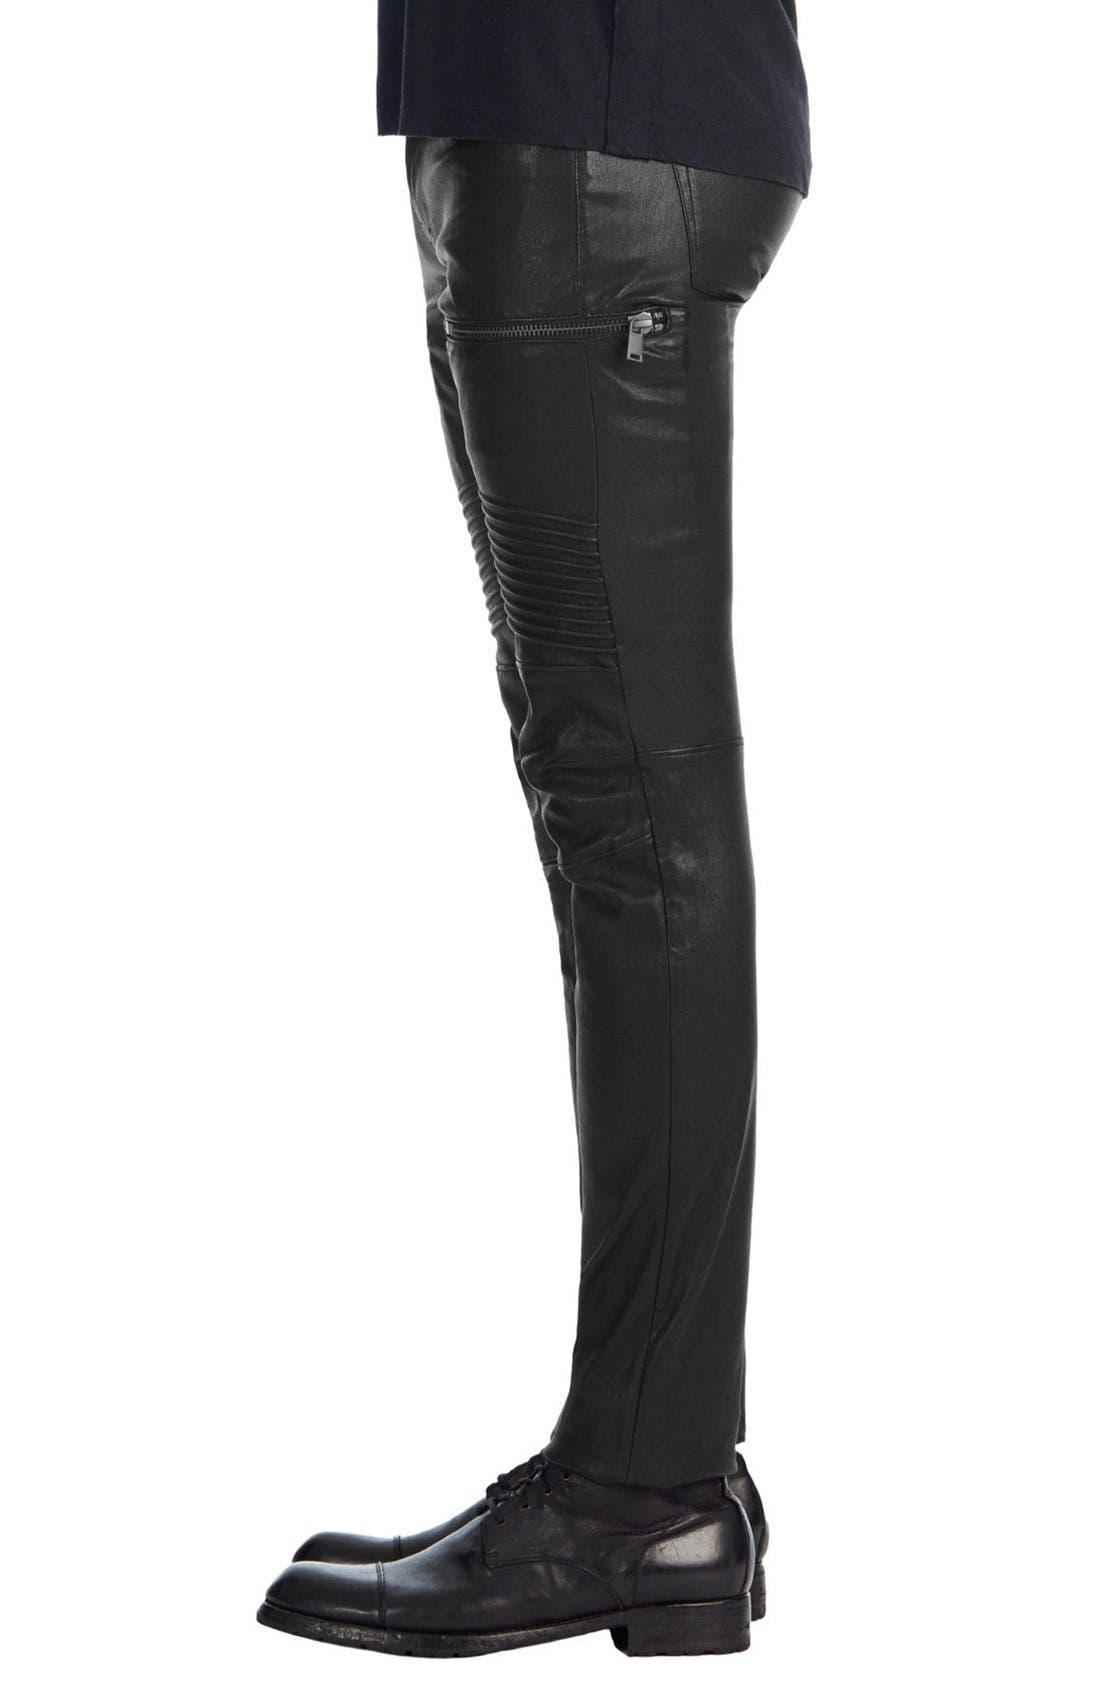 Acrux Skinny Fit Moto Leather Pants,                             Alternate thumbnail 3, color,                             Black